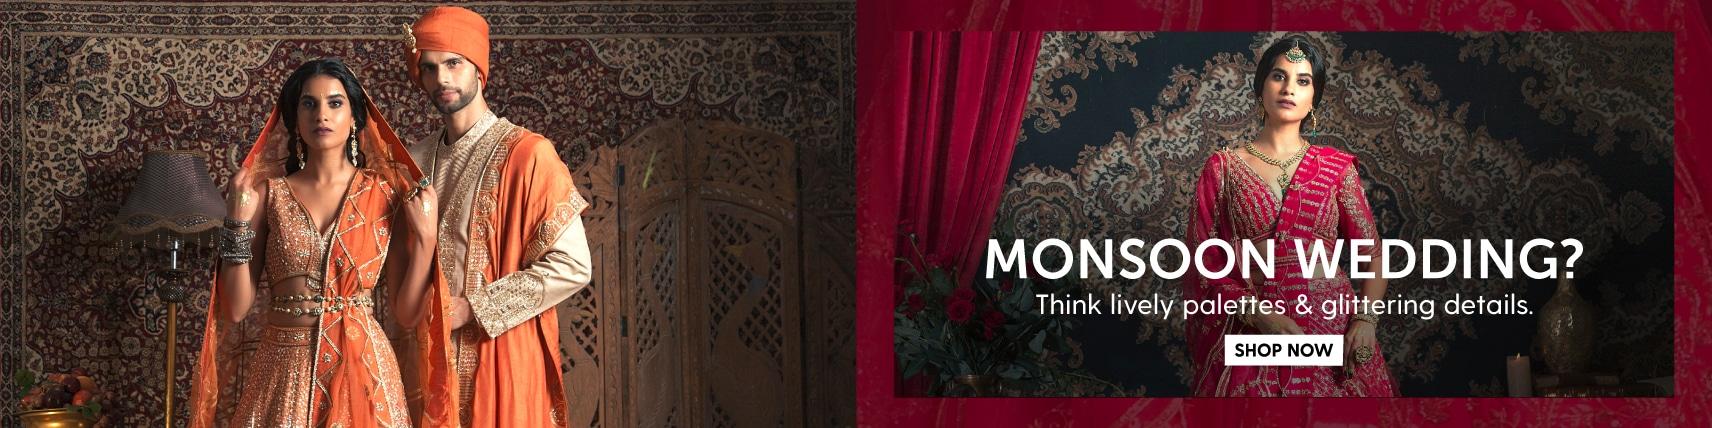 trends/monsoon-wedding?utm_source=LandingPage&utm_medium=Banner&utm_campaign=Monsoon-Wedding